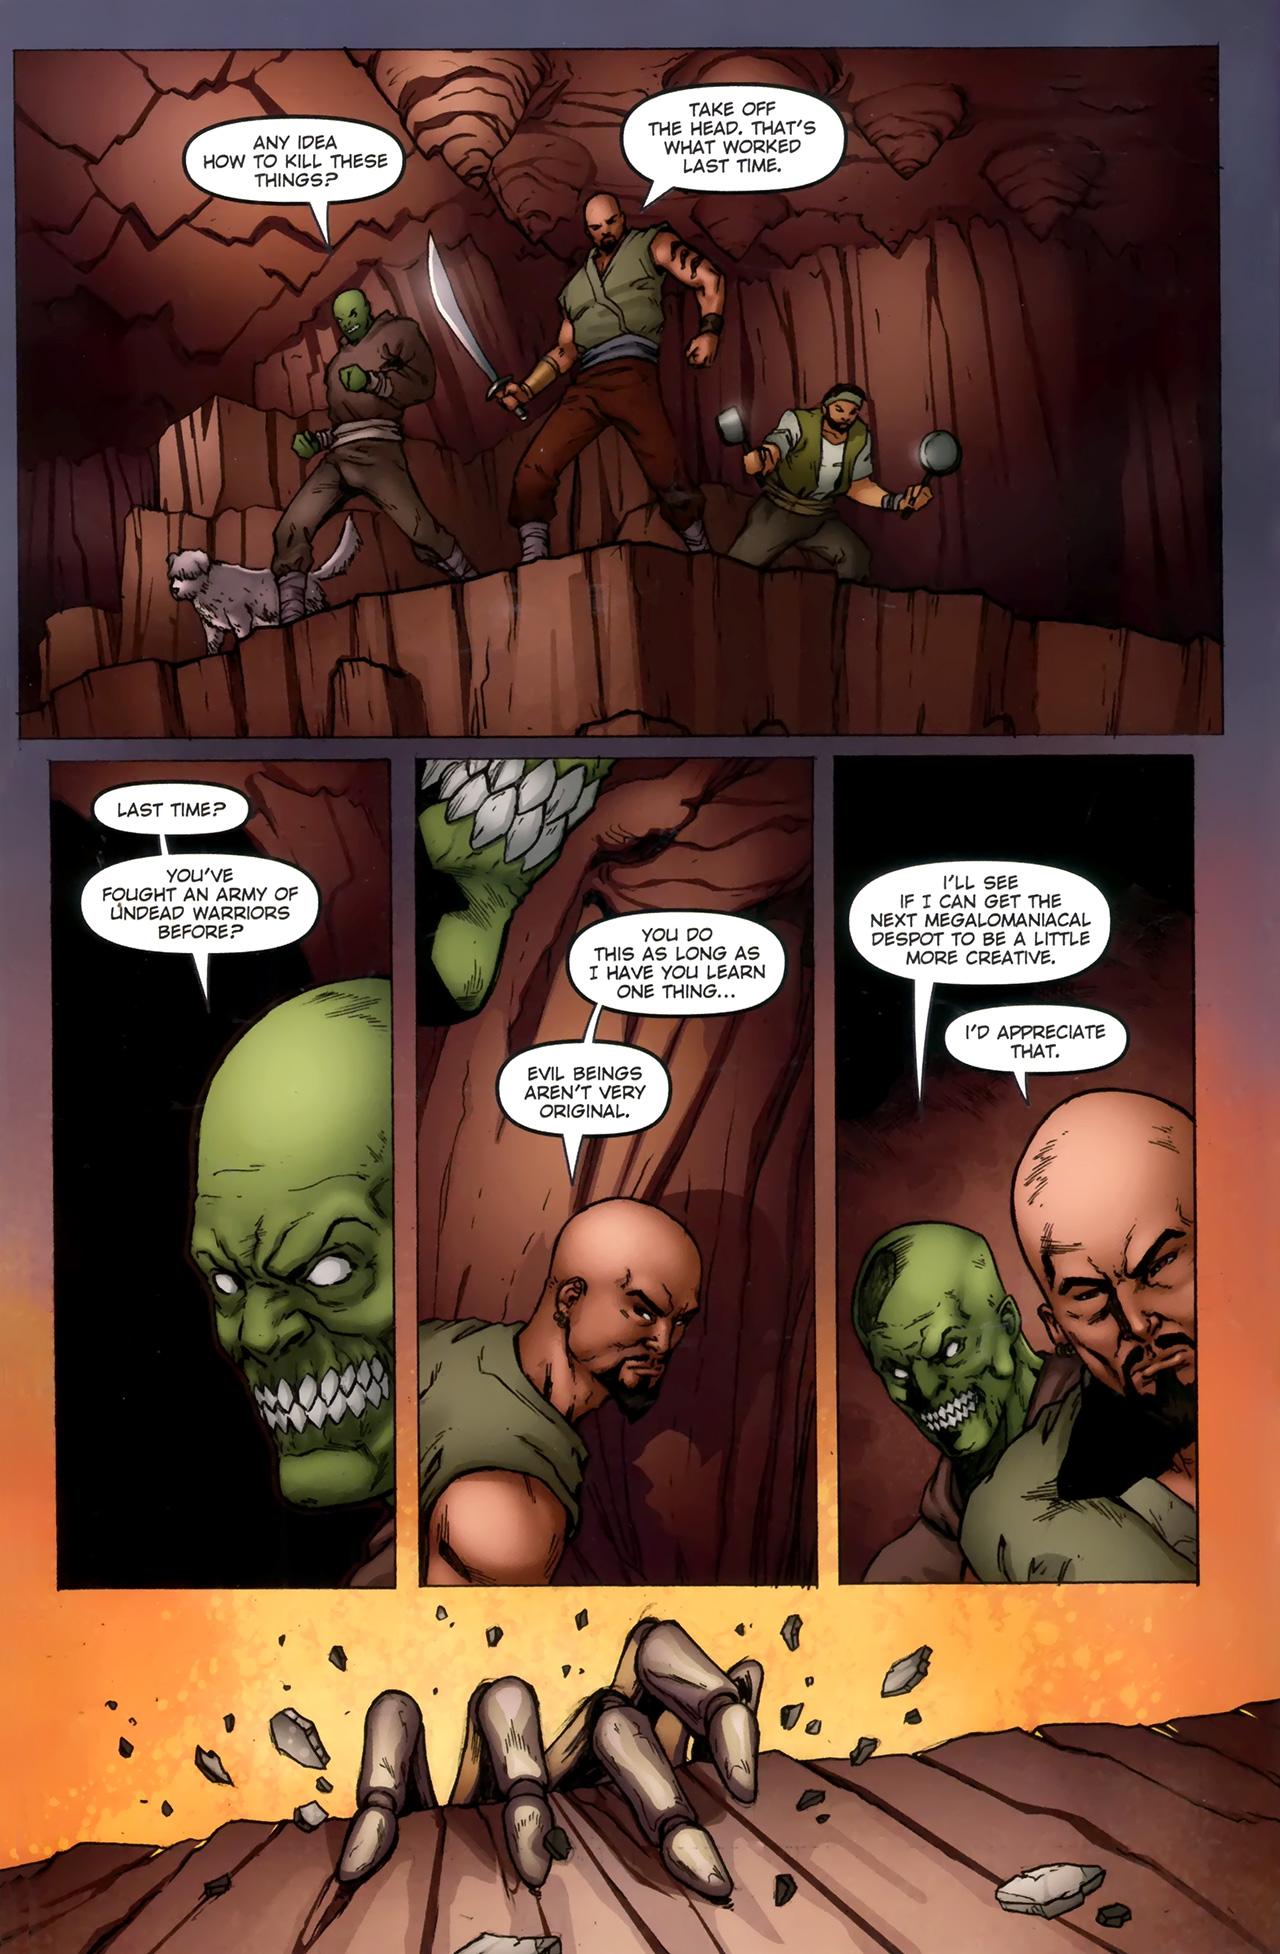 Read online 1001 Arabian Nights: The Adventures of Sinbad comic -  Issue #11 - 8